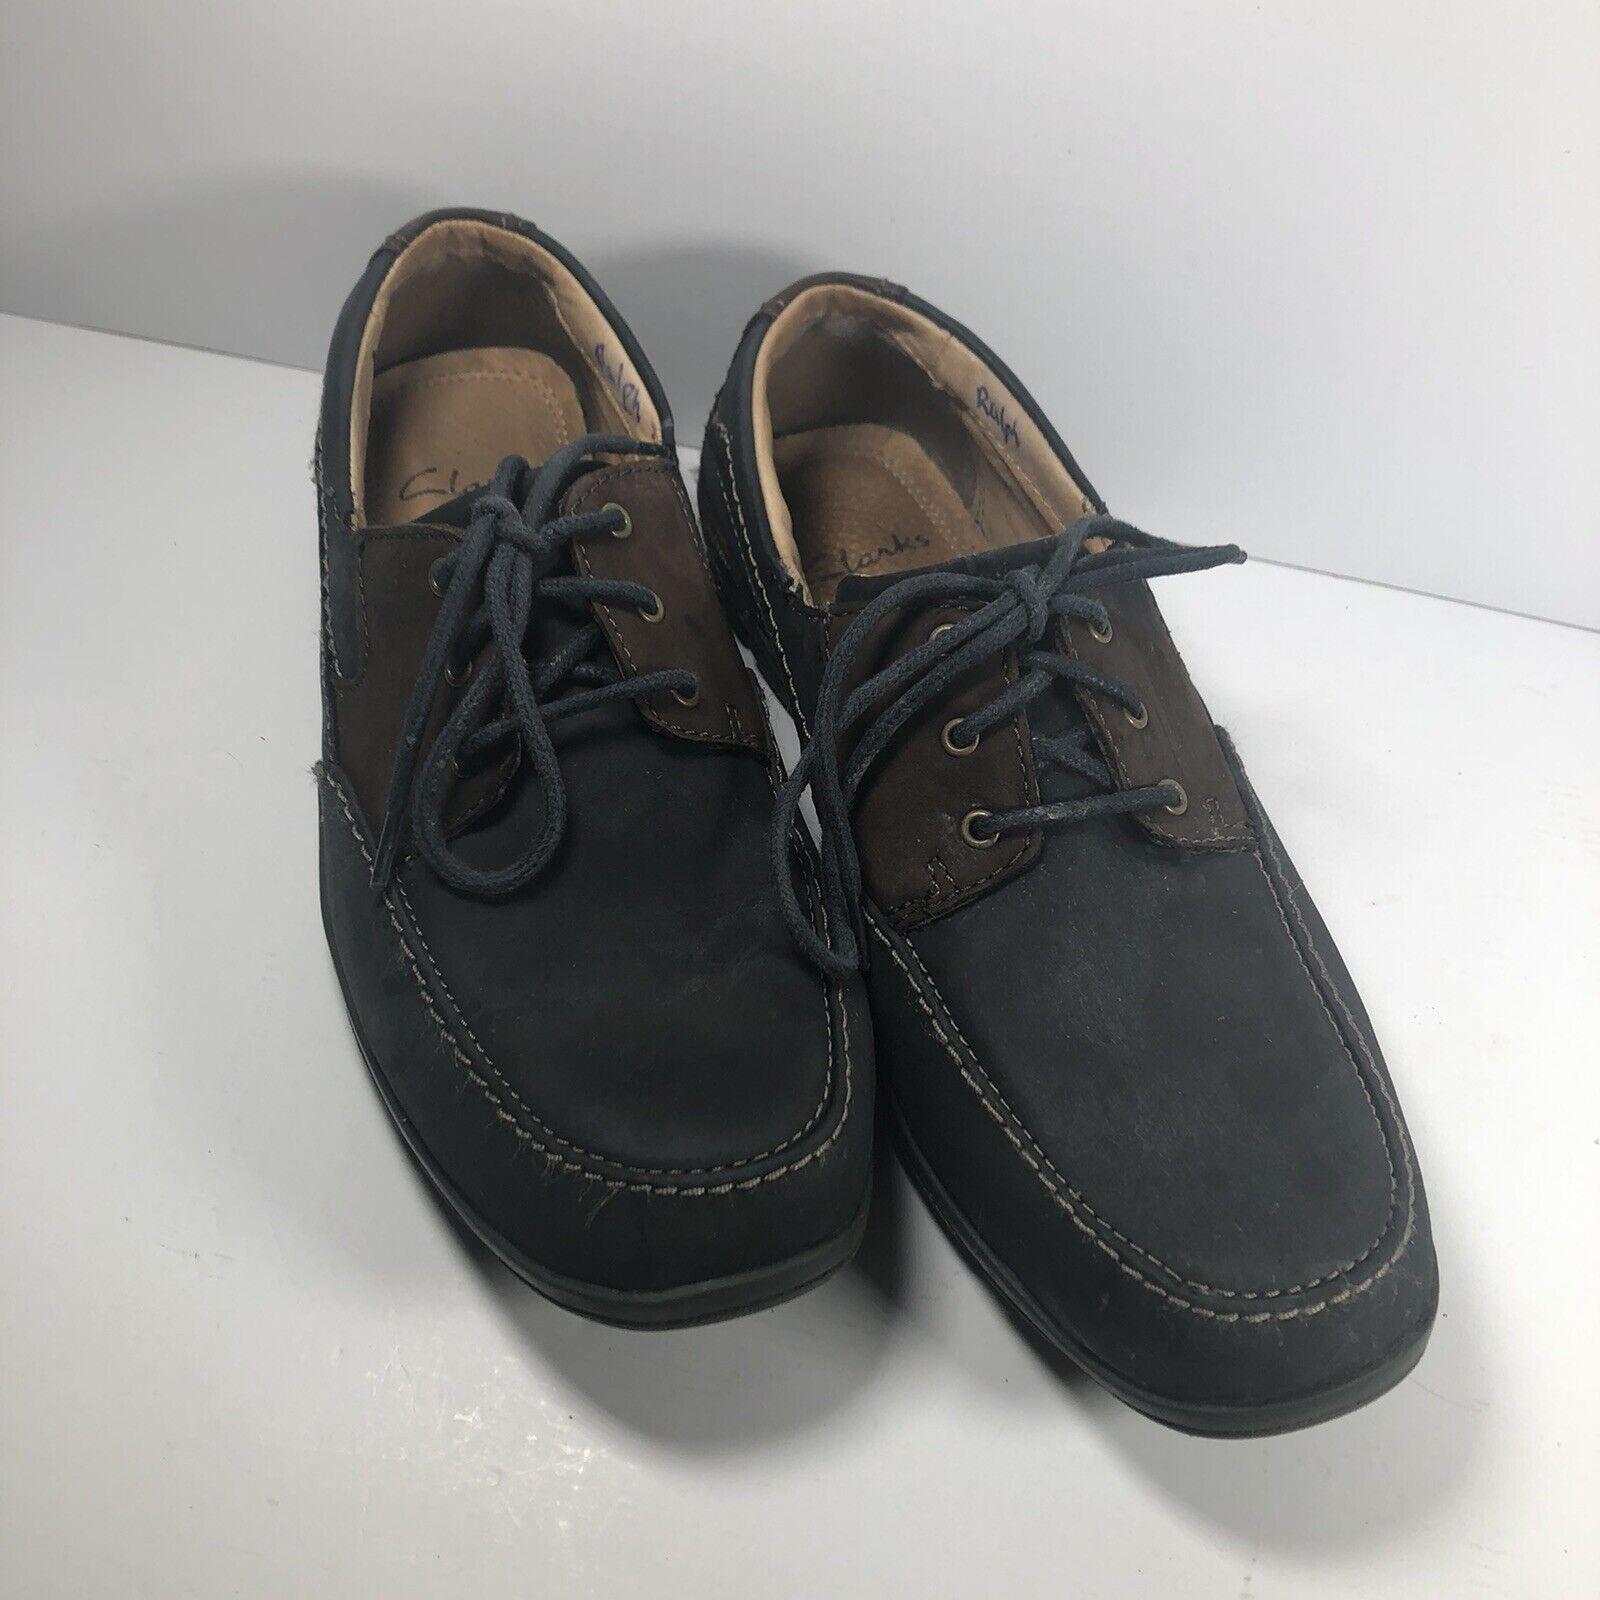 Clarks Mens Latch Bay Navy Combi NBK Shoes UK 7G